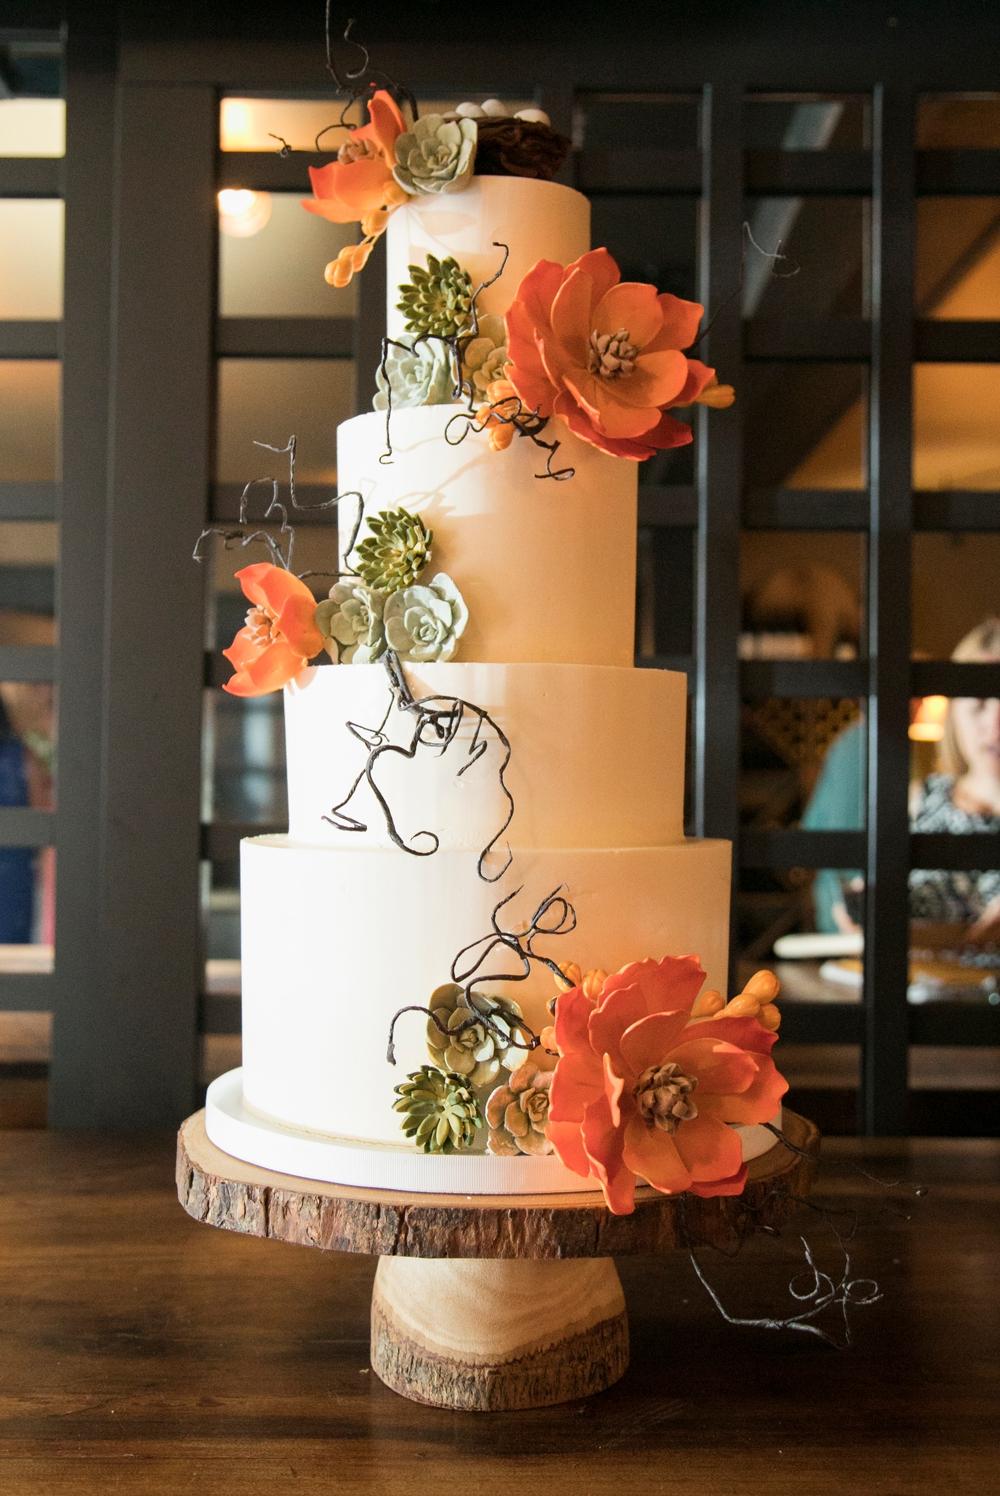 white-three-tiered-wedding-cake-with-large-orange-flowers